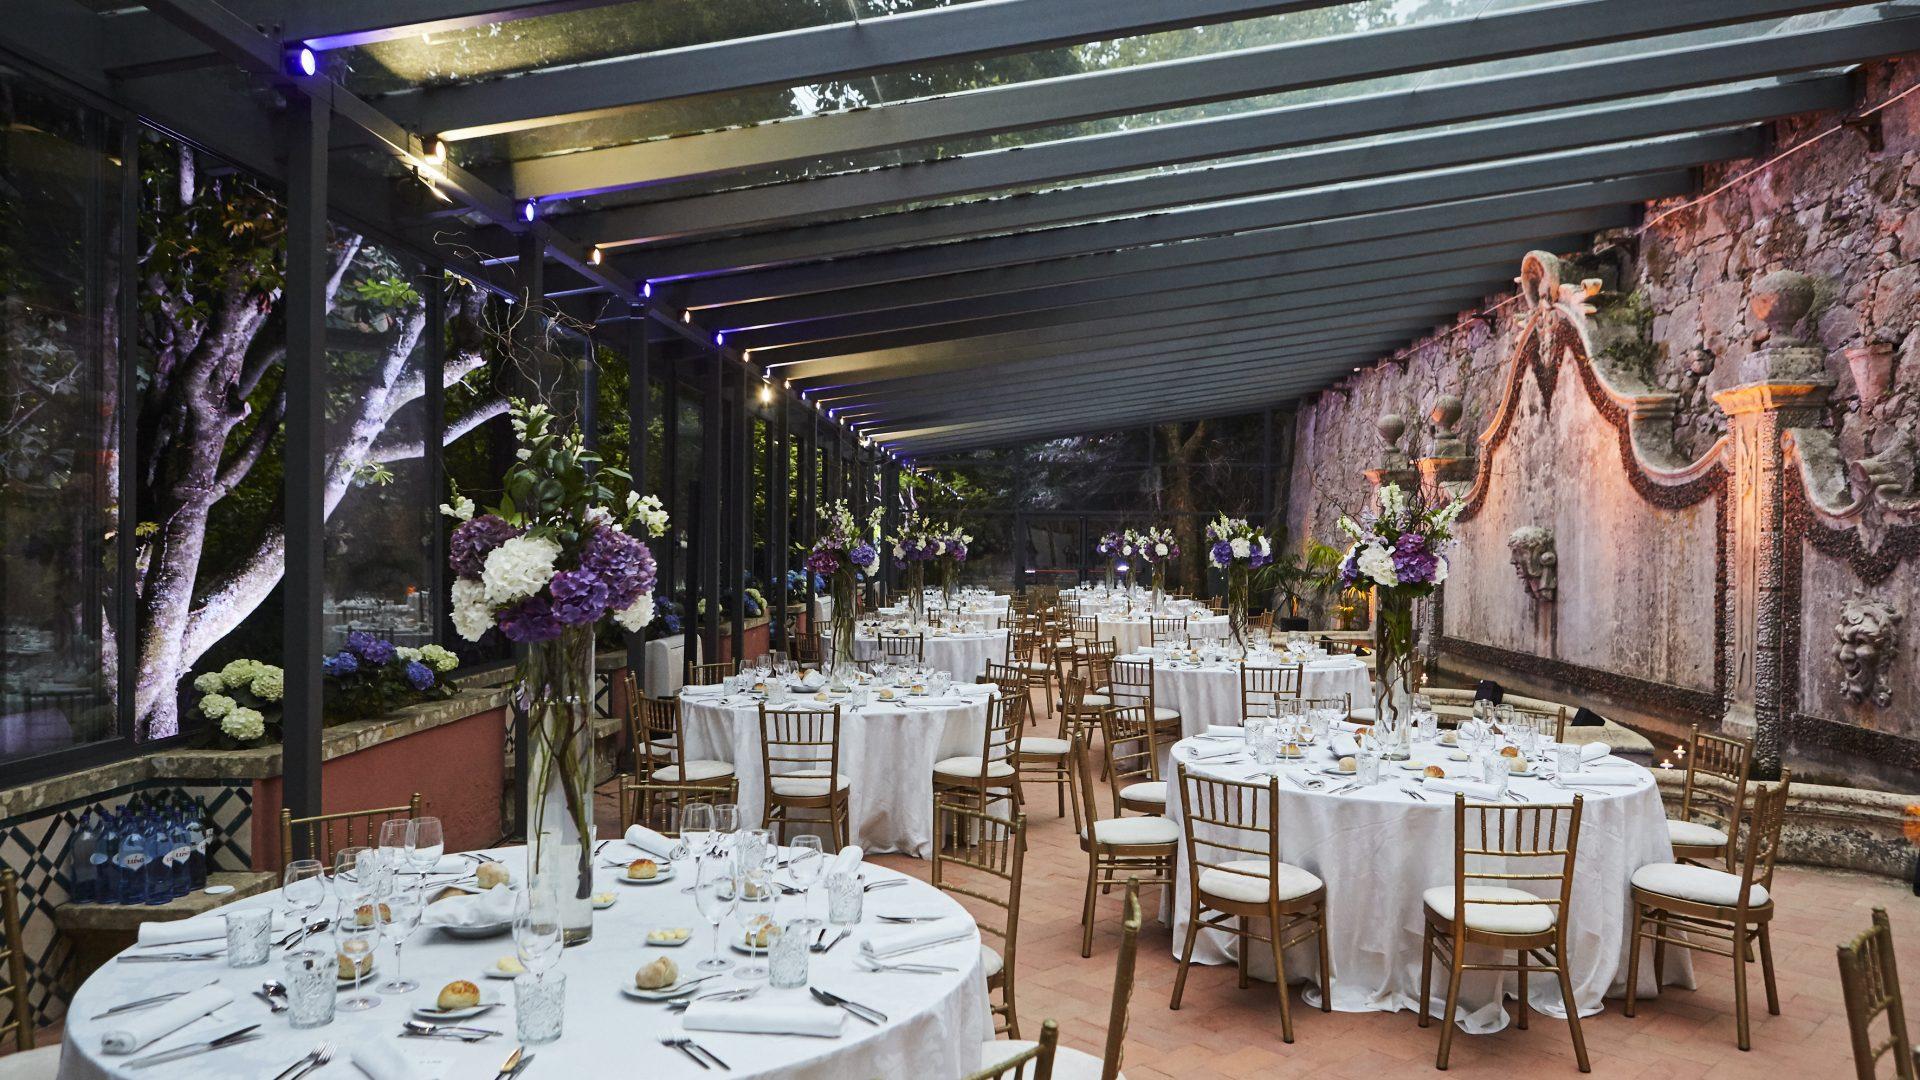 Gala dinner setup in event venue in Lisbon